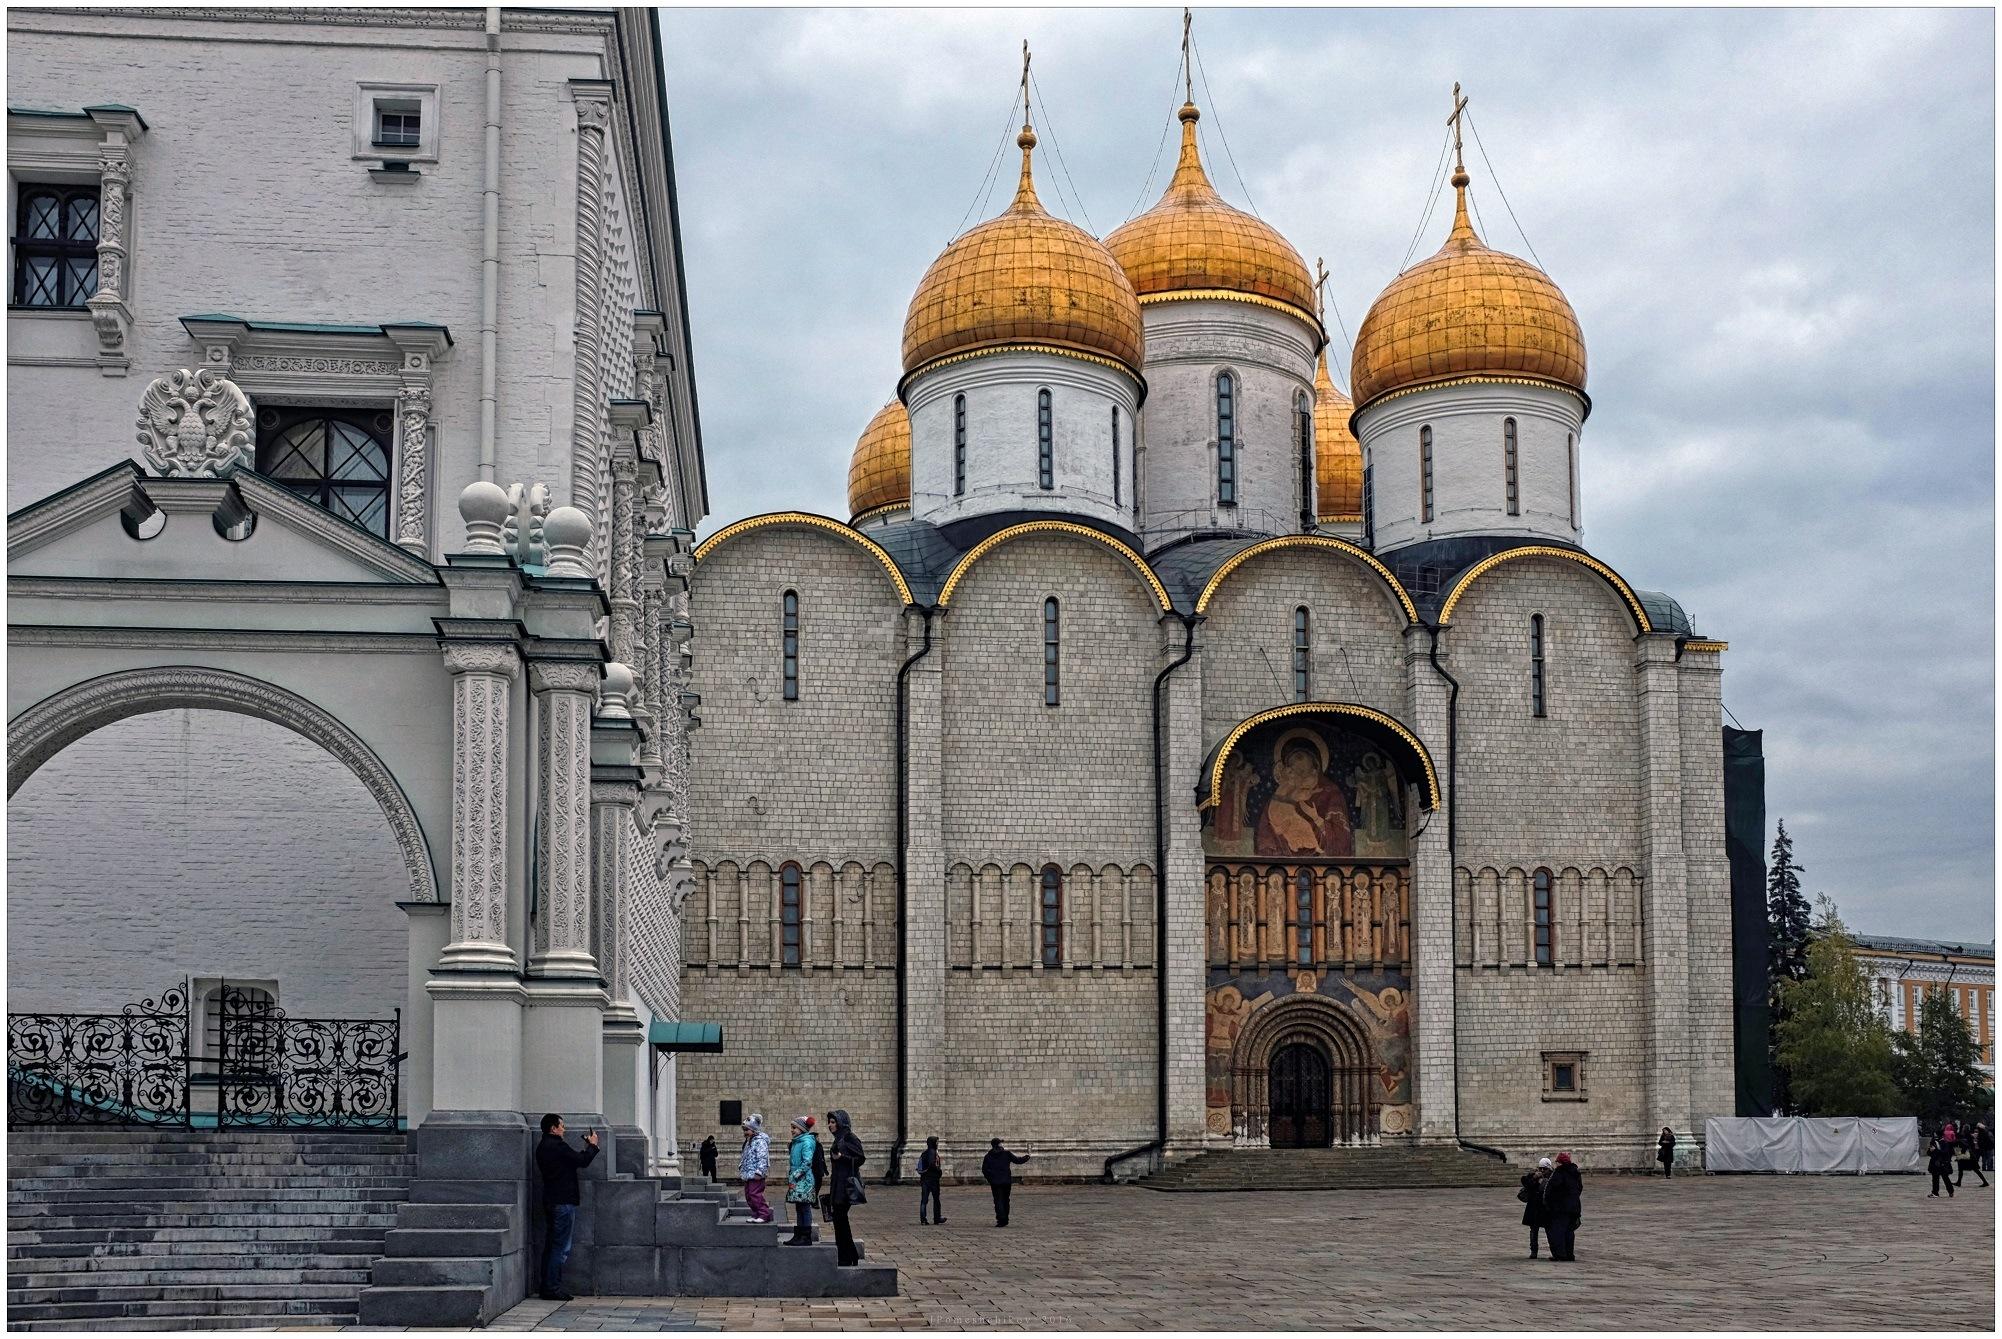 Успенский Собор by igorcentr